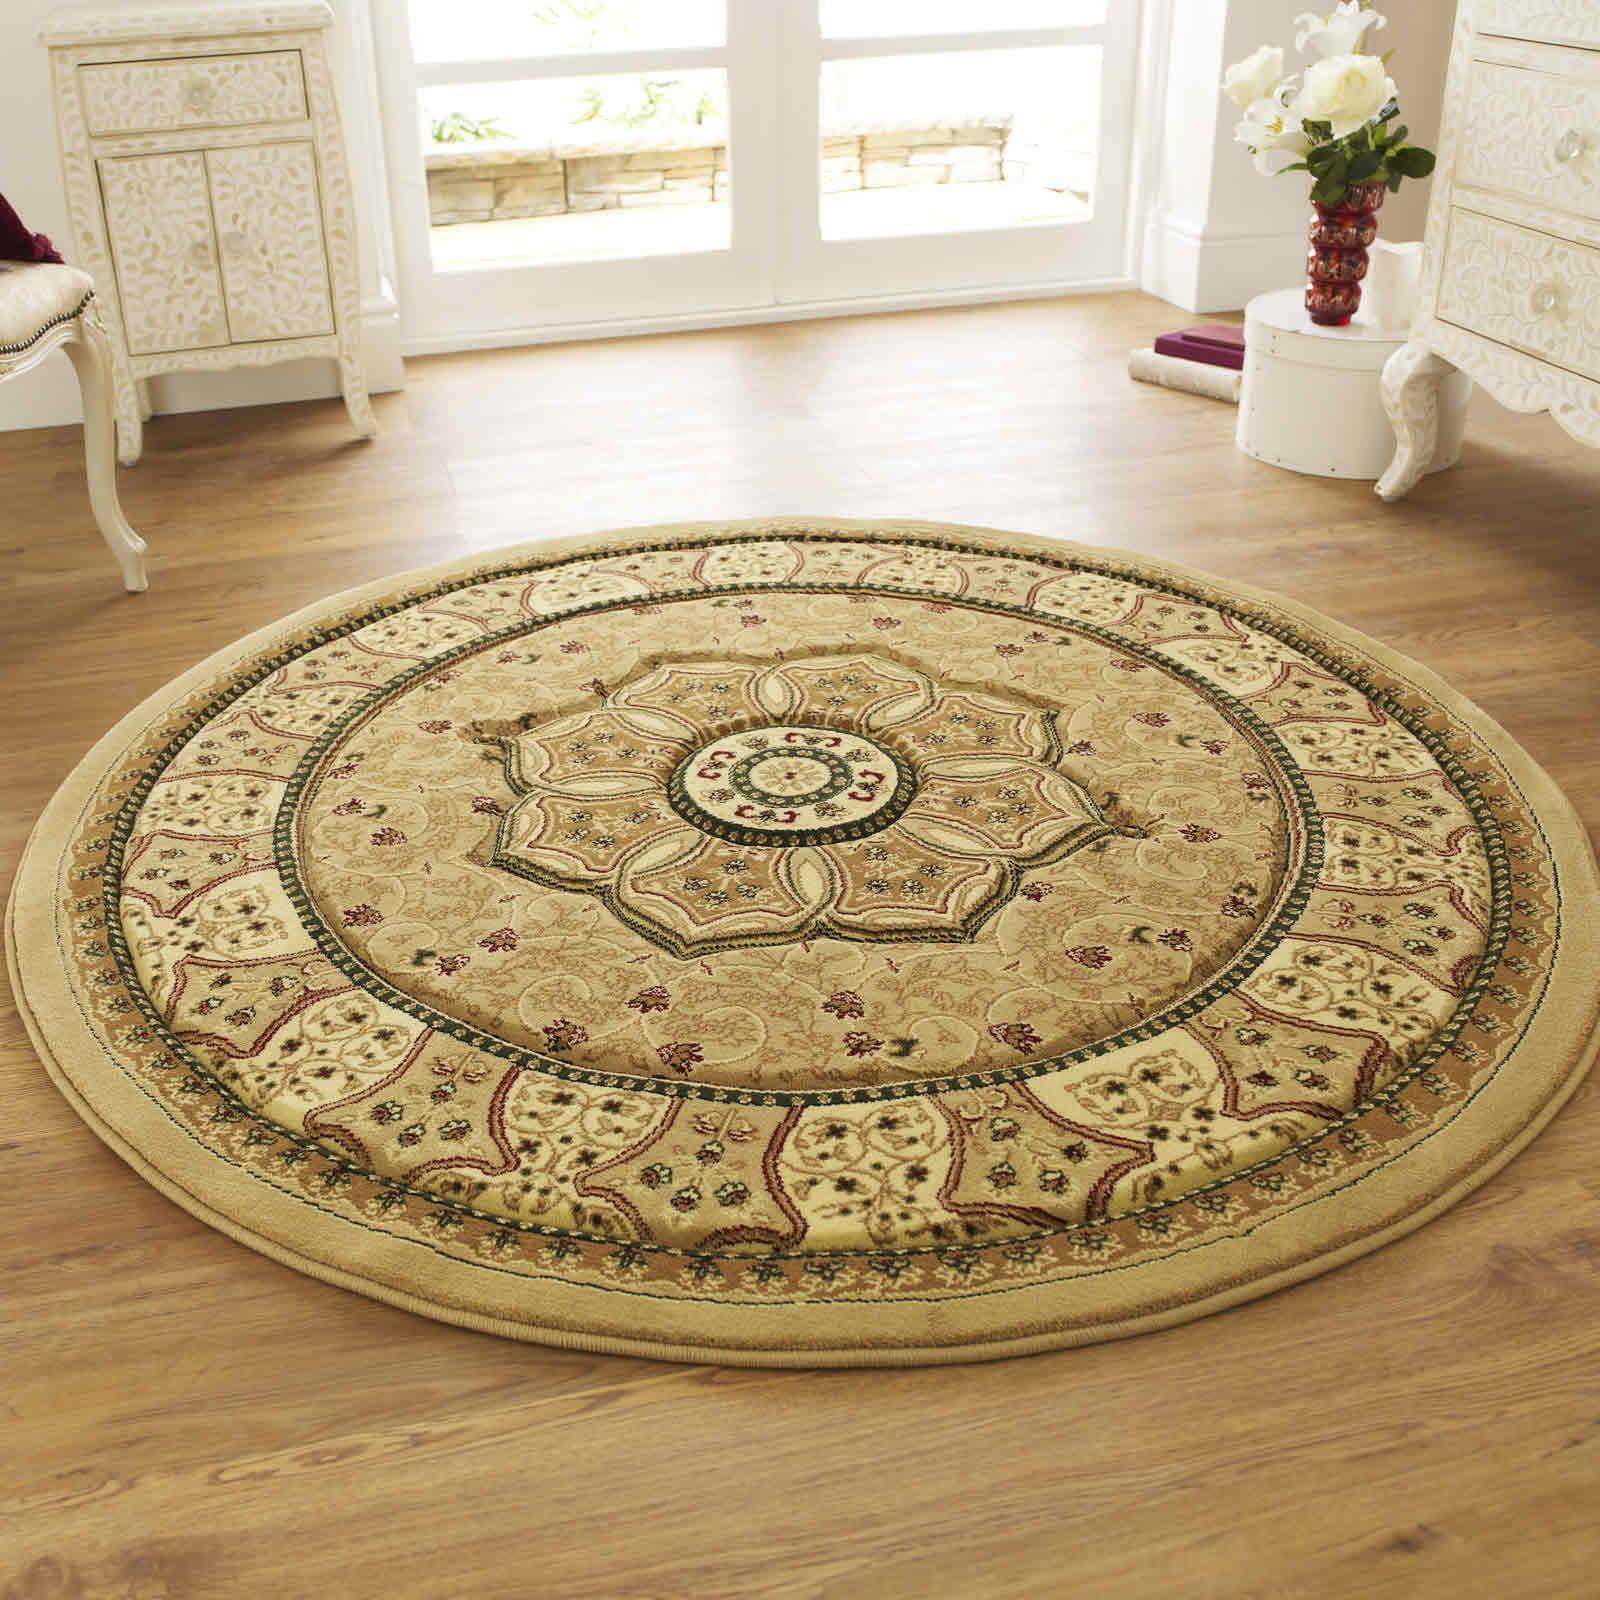 Heritage 4400 Circular Rugs In Beige150x150cm Circle Traditional Rugs Circular Rugs Rugs